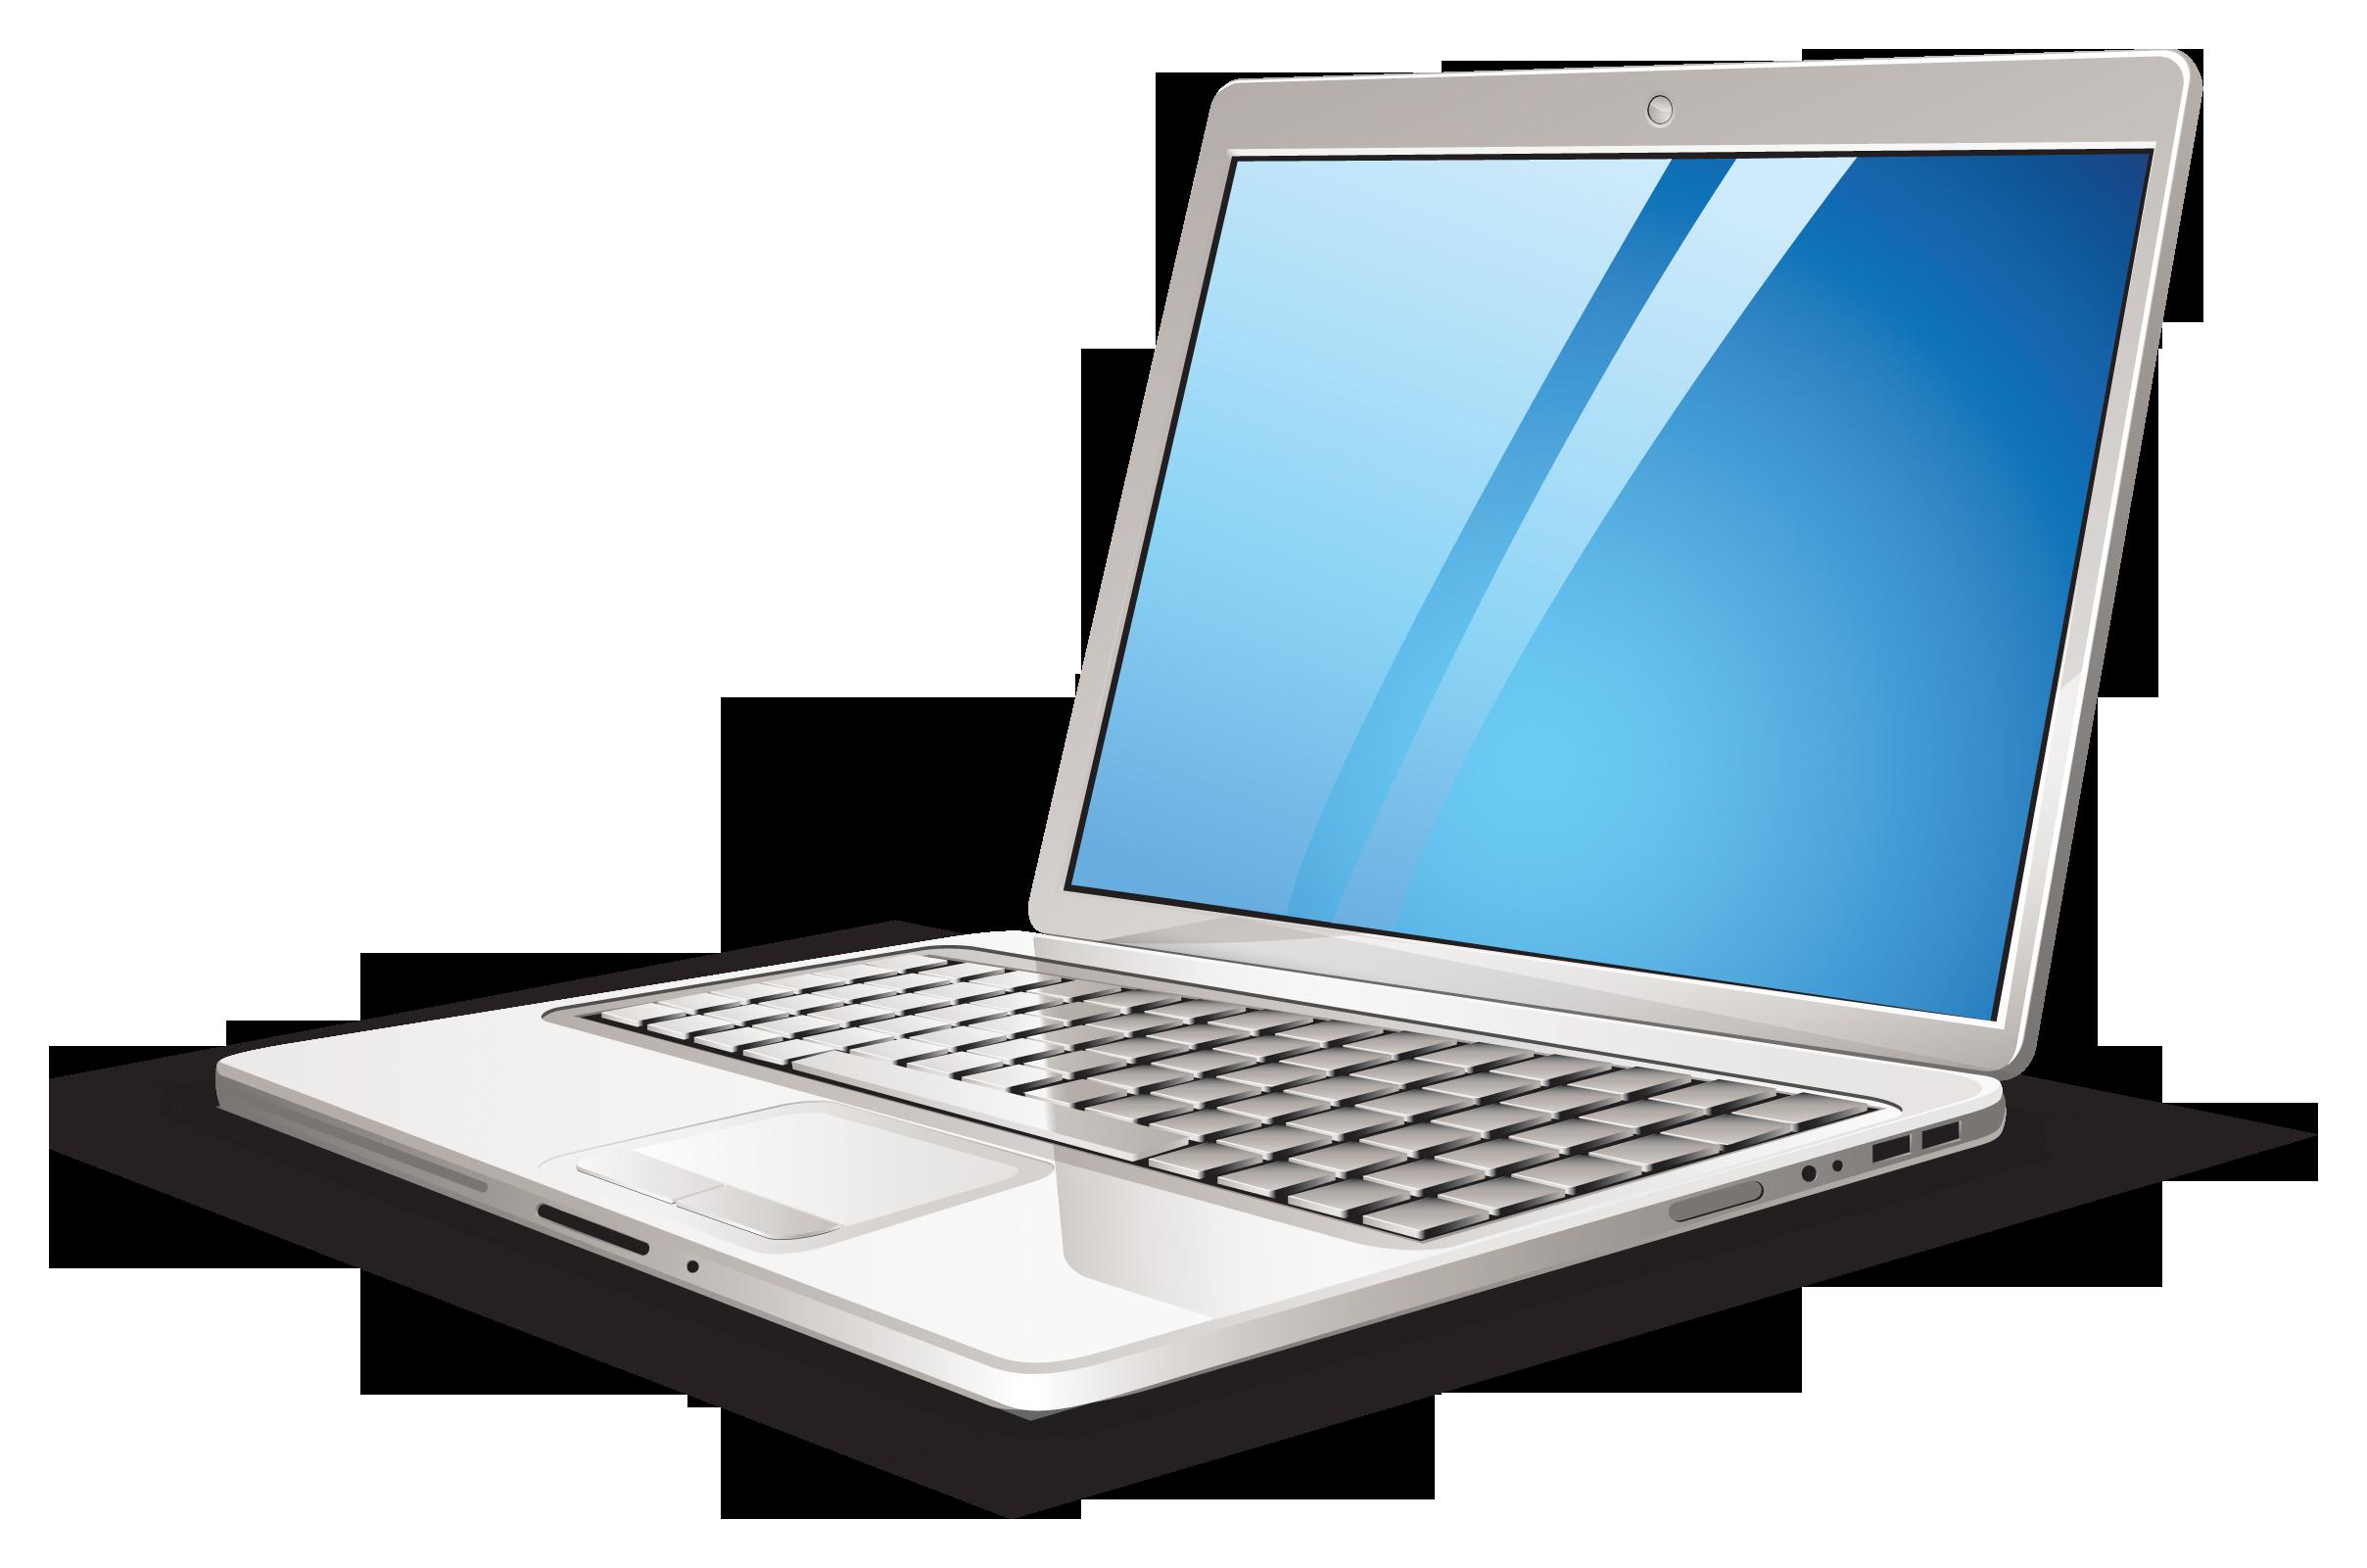 Laptop & Computer